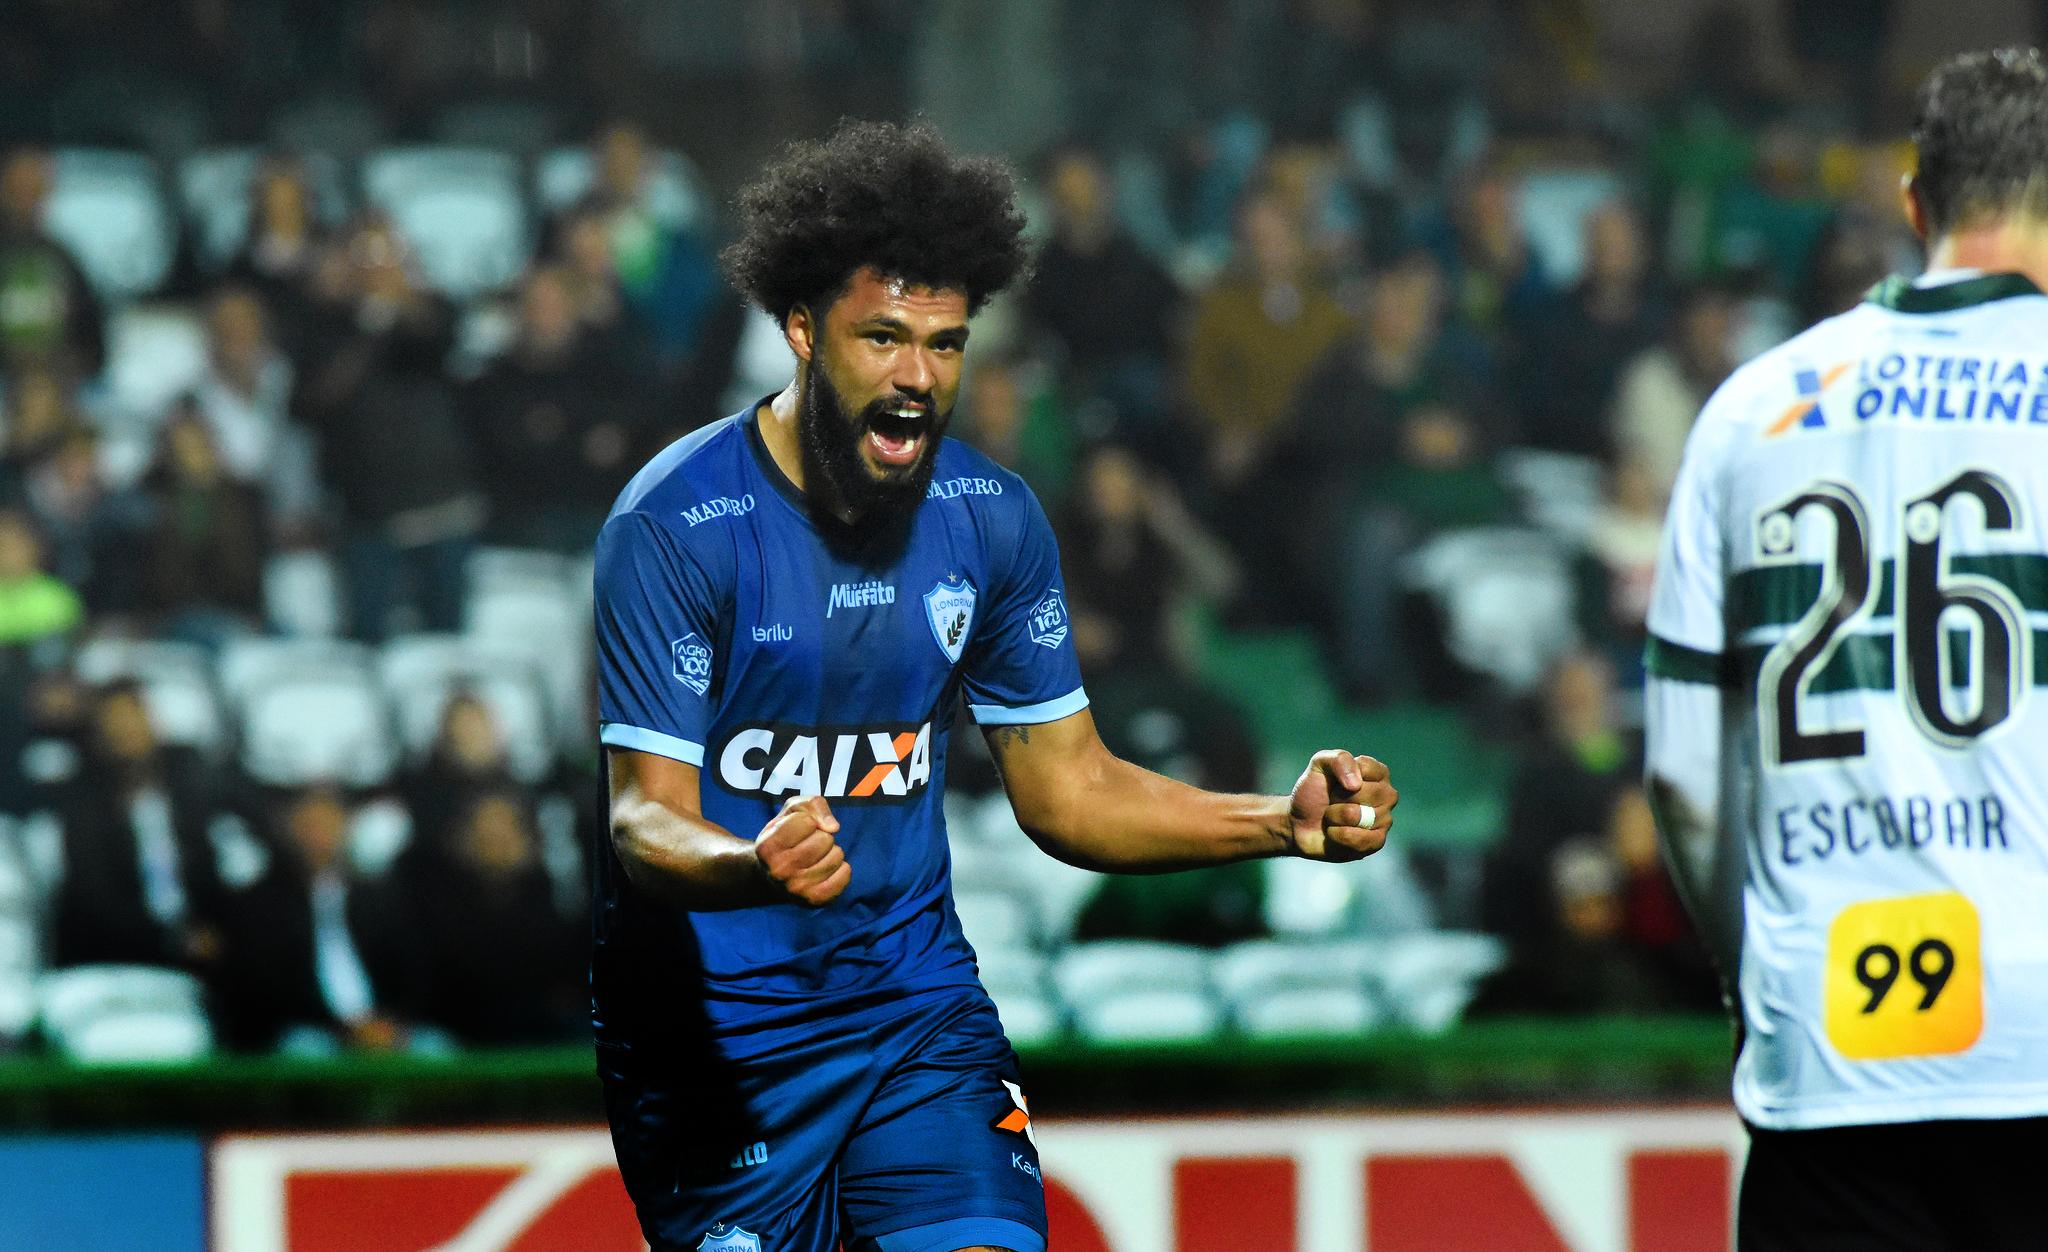 Londrina Lucas Costa Foto Gustavo Oliveira Londrina Esporte Clube